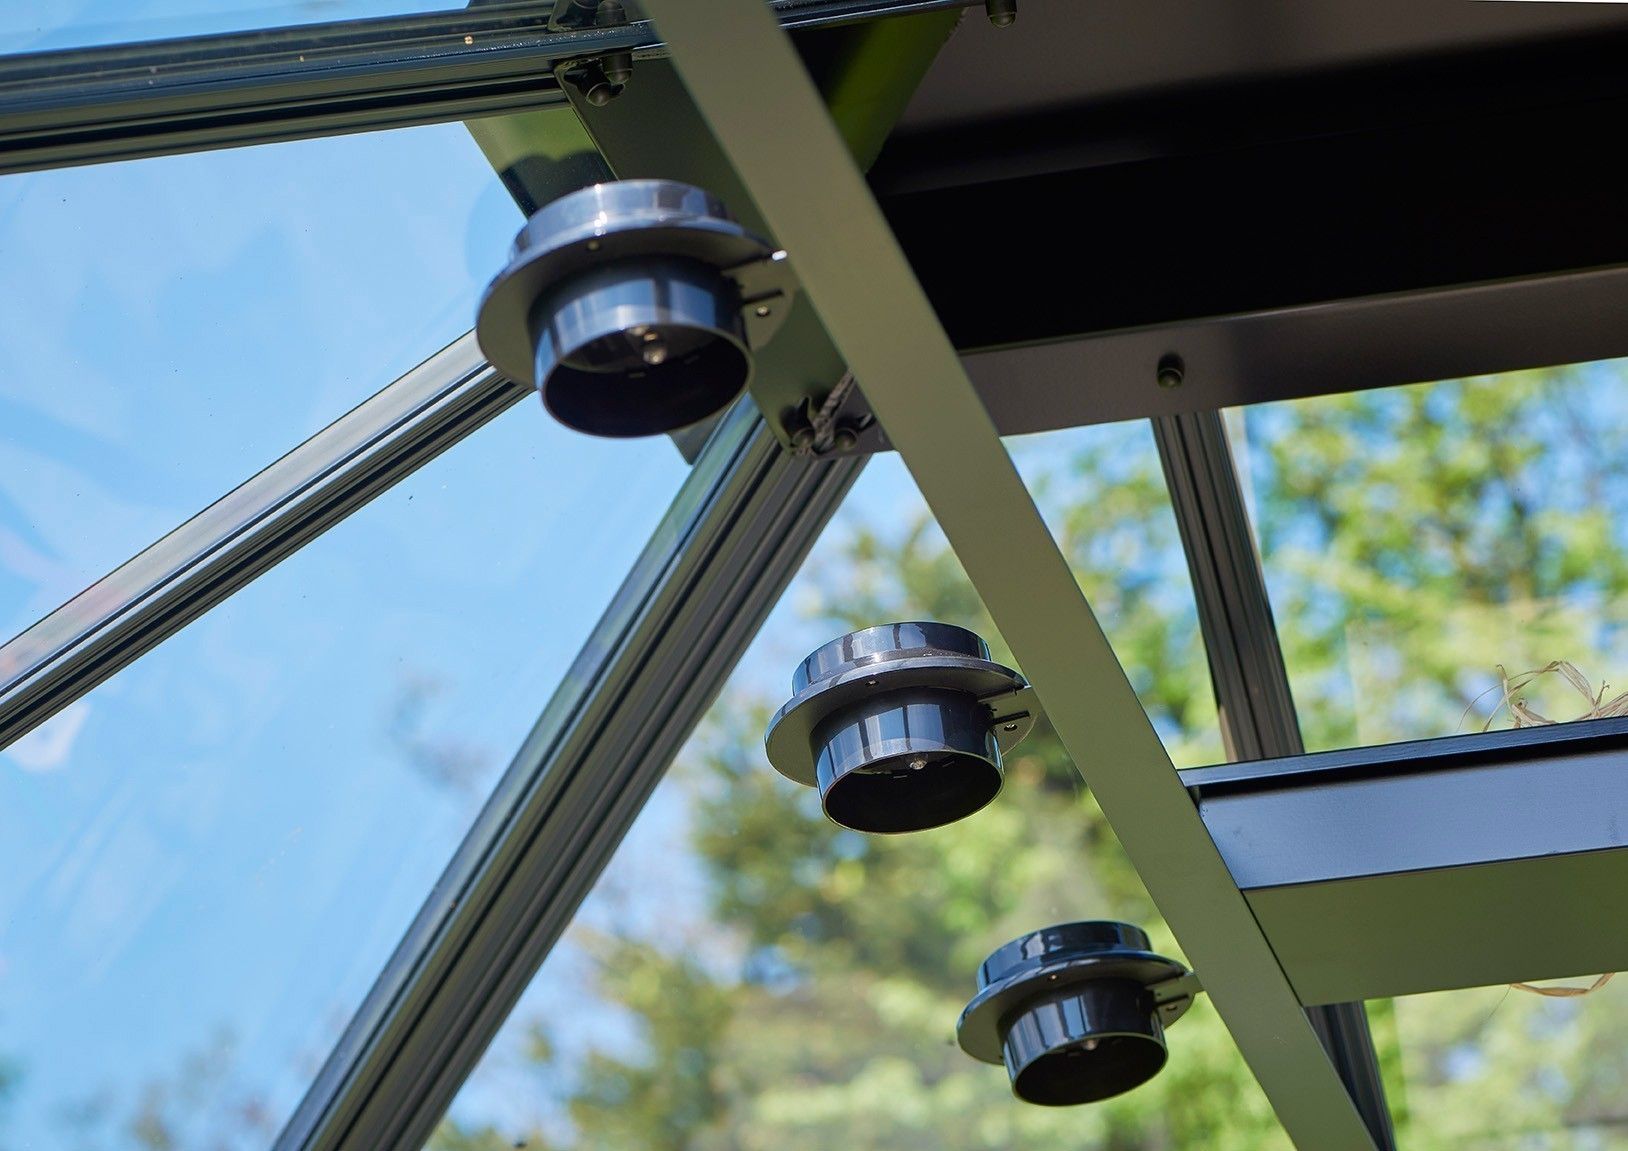 Juliana LED Solar Lampe für Gewächshäuser Bild 3